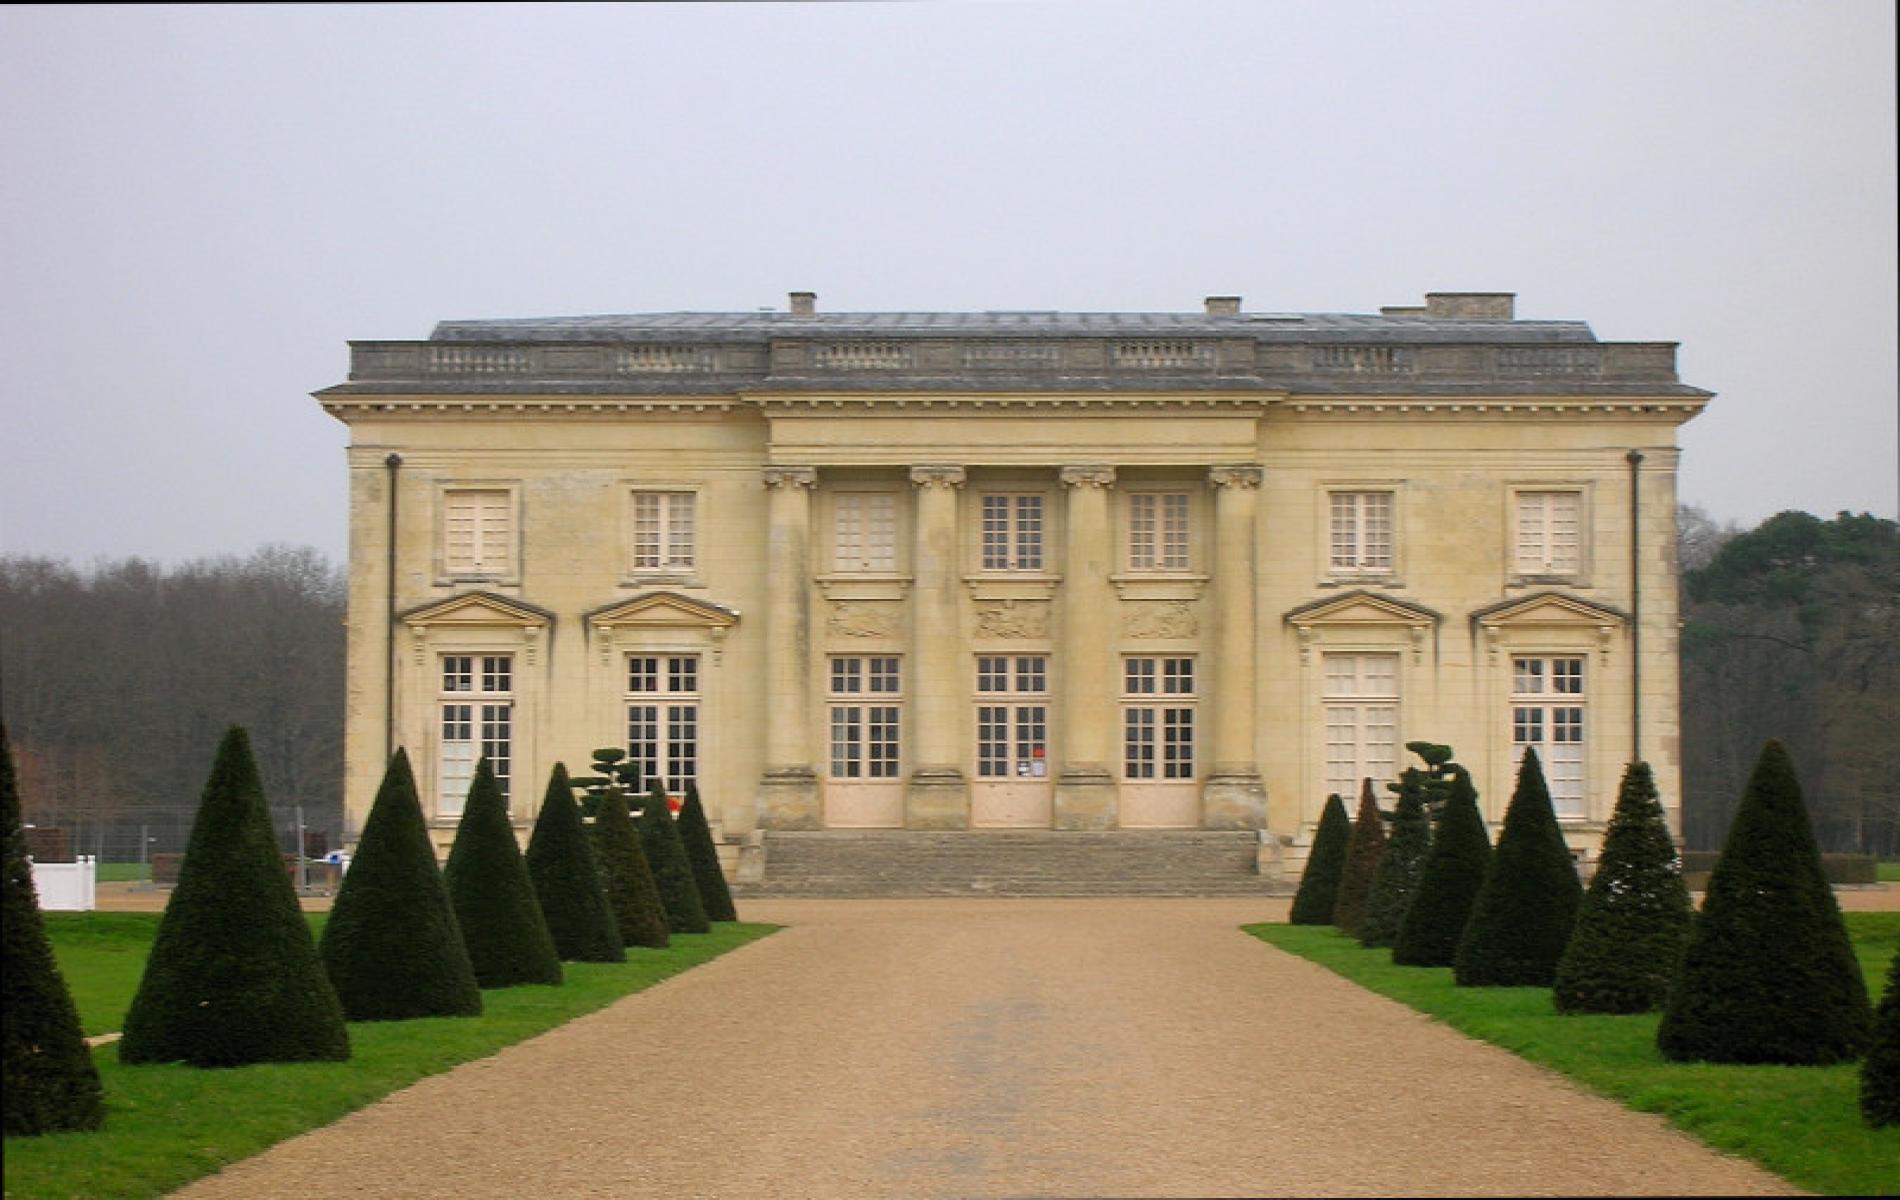 Château de Pignerolle